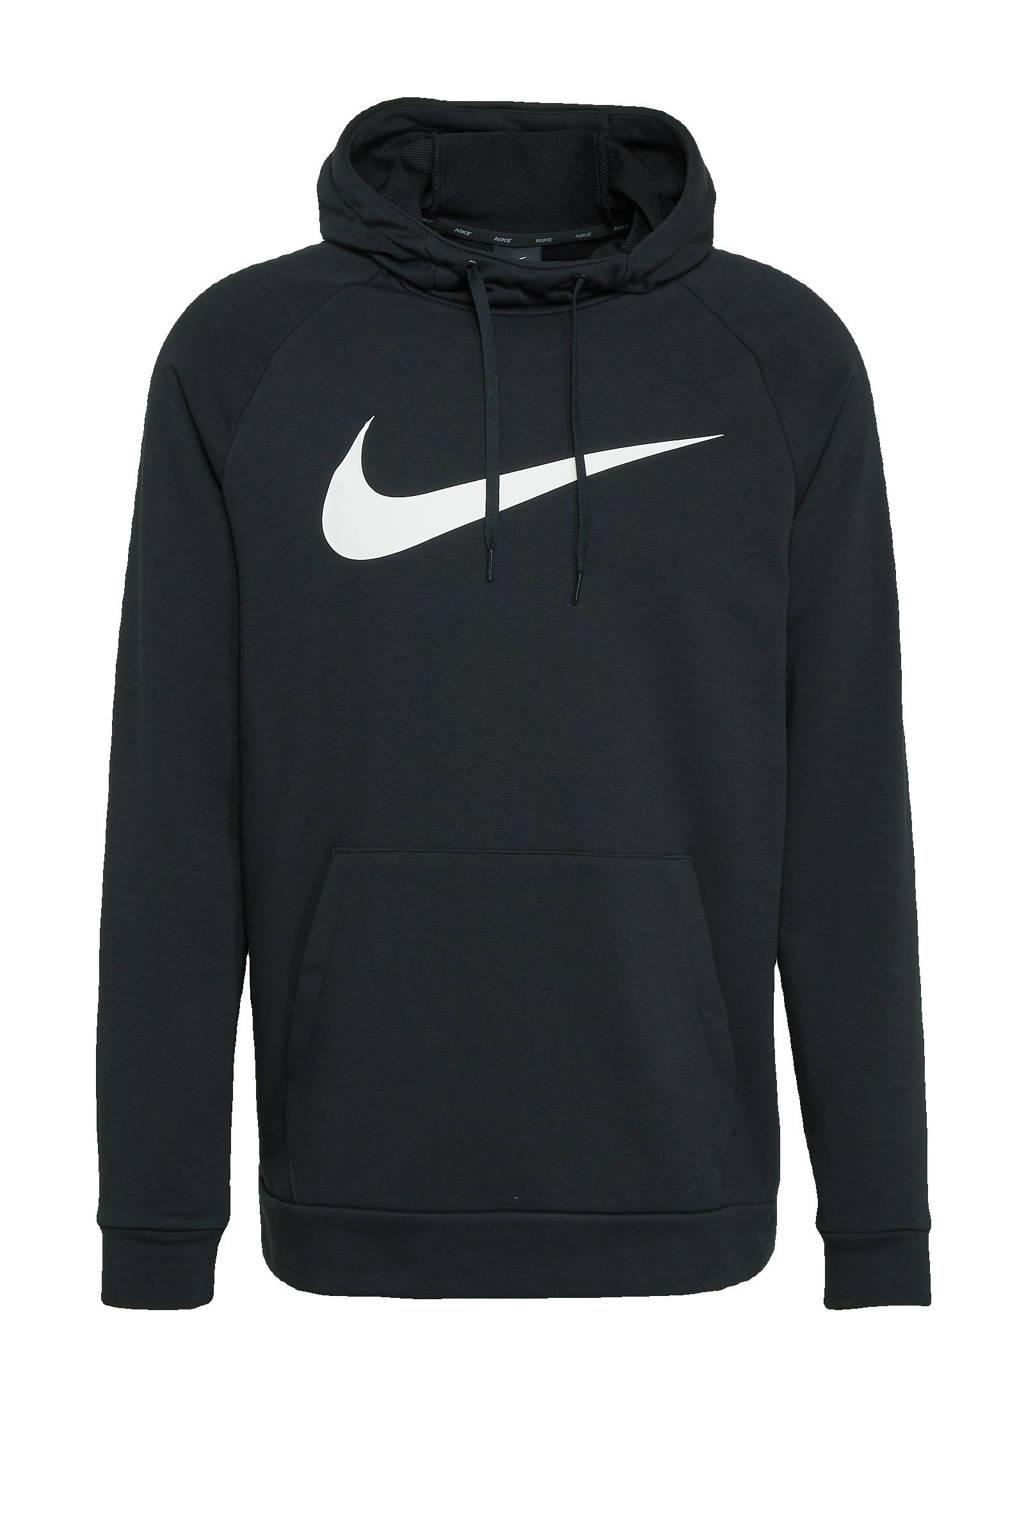 Nike   sportsweater zwart/wit, Zwart/wit